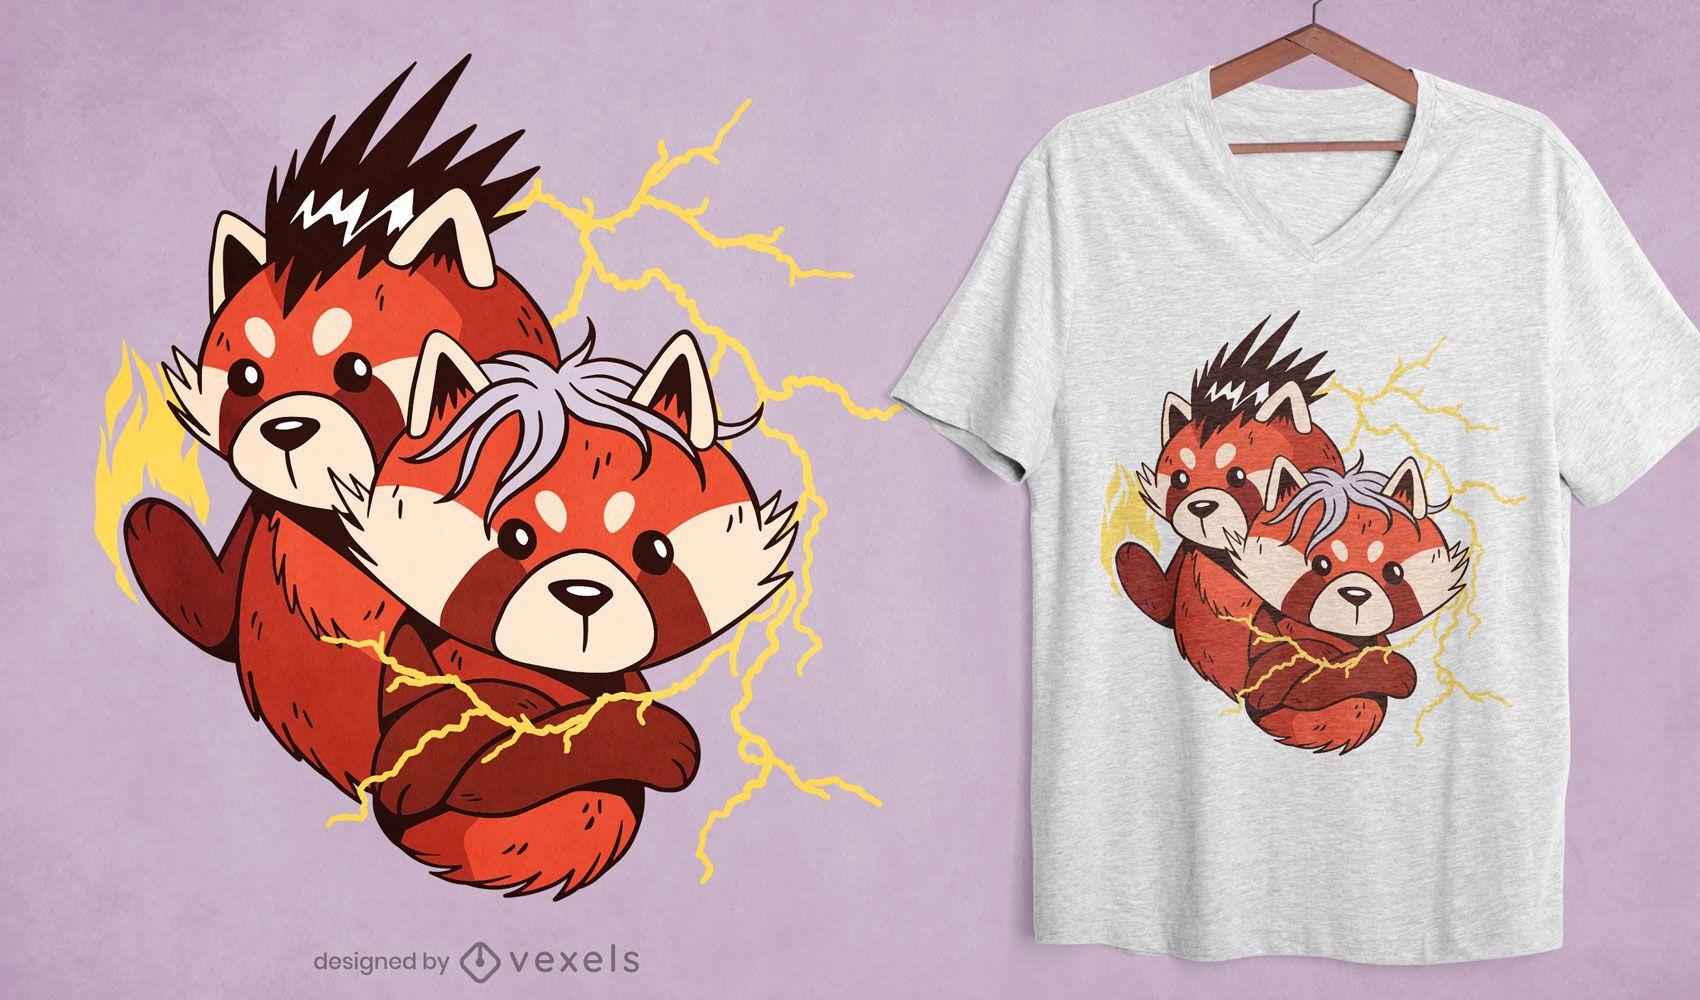 Powerful red panda cartoon t-shirt design